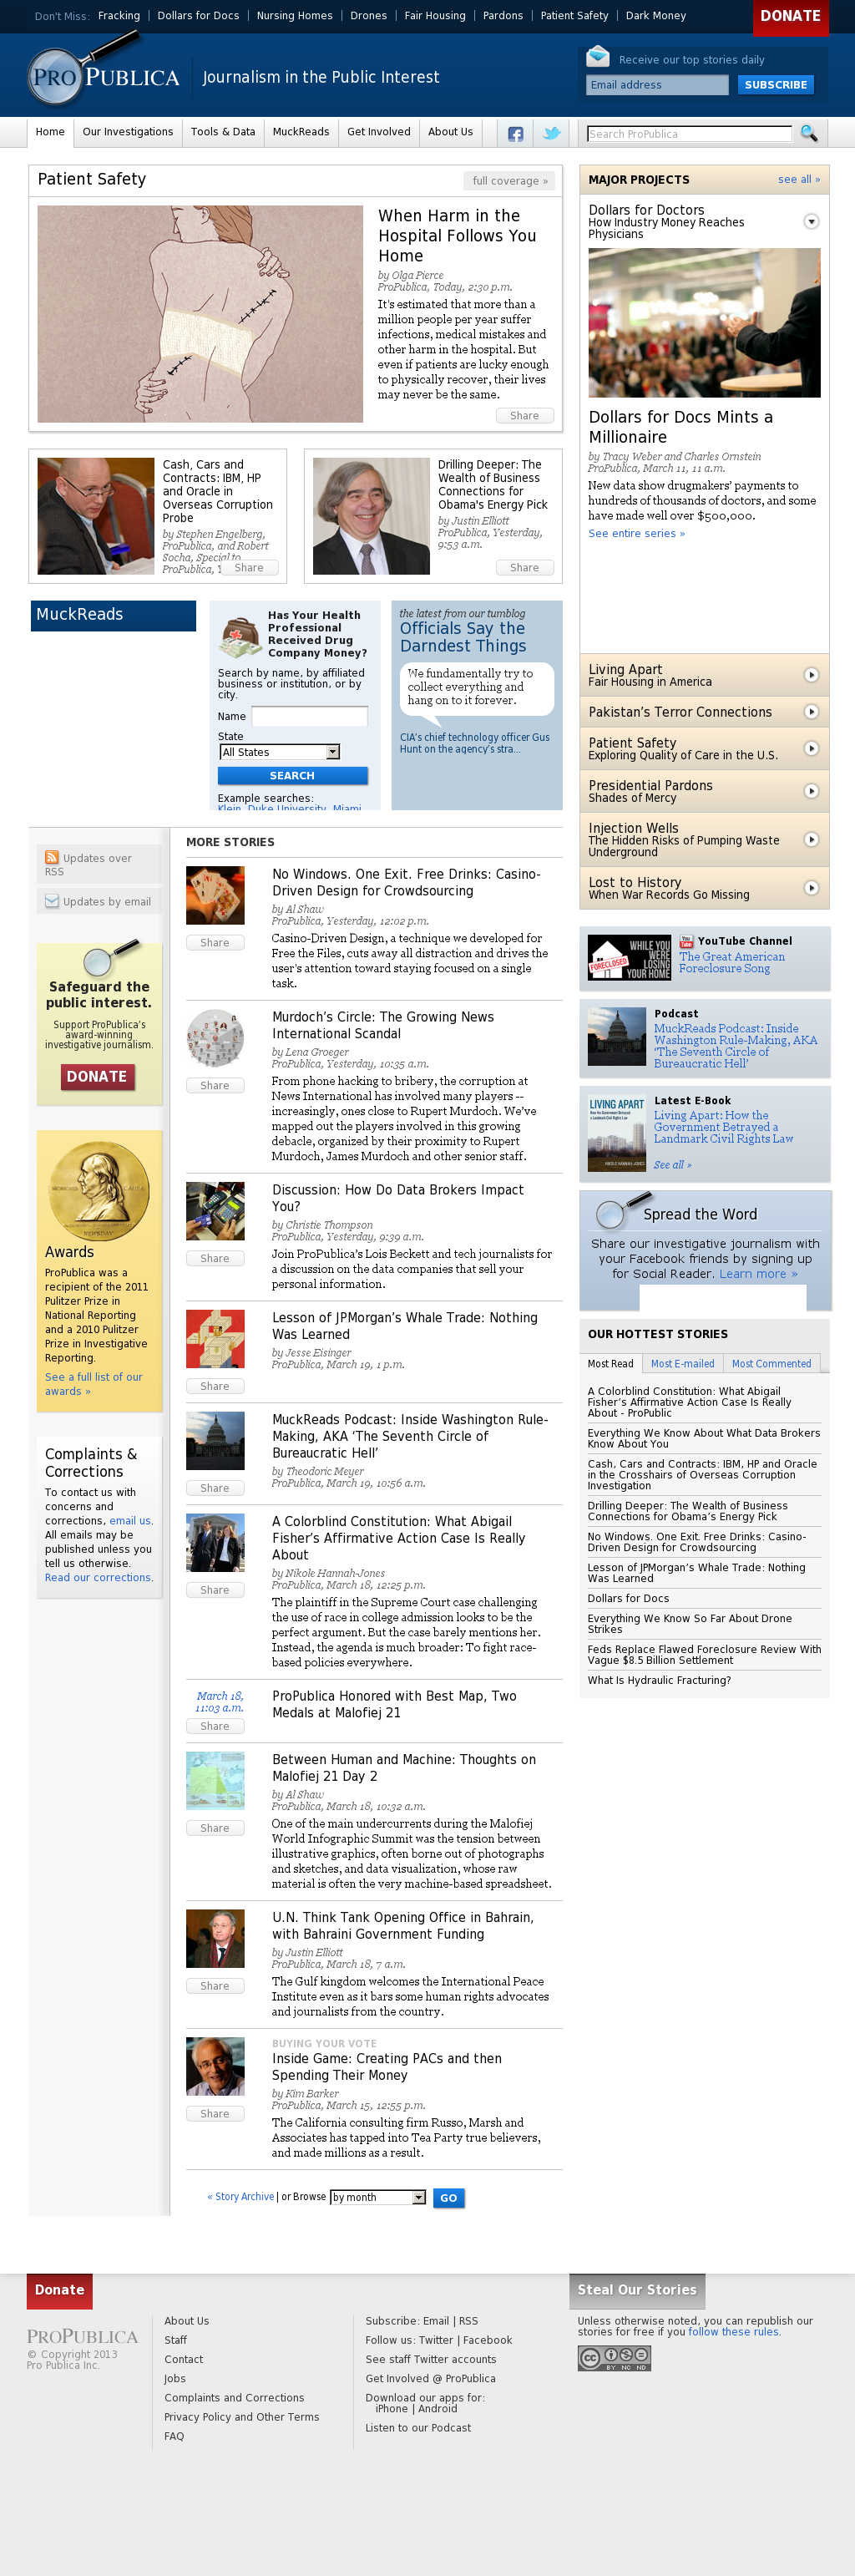 ProPublica at Thursday March 21, 2013, 8:18 p.m. UTC